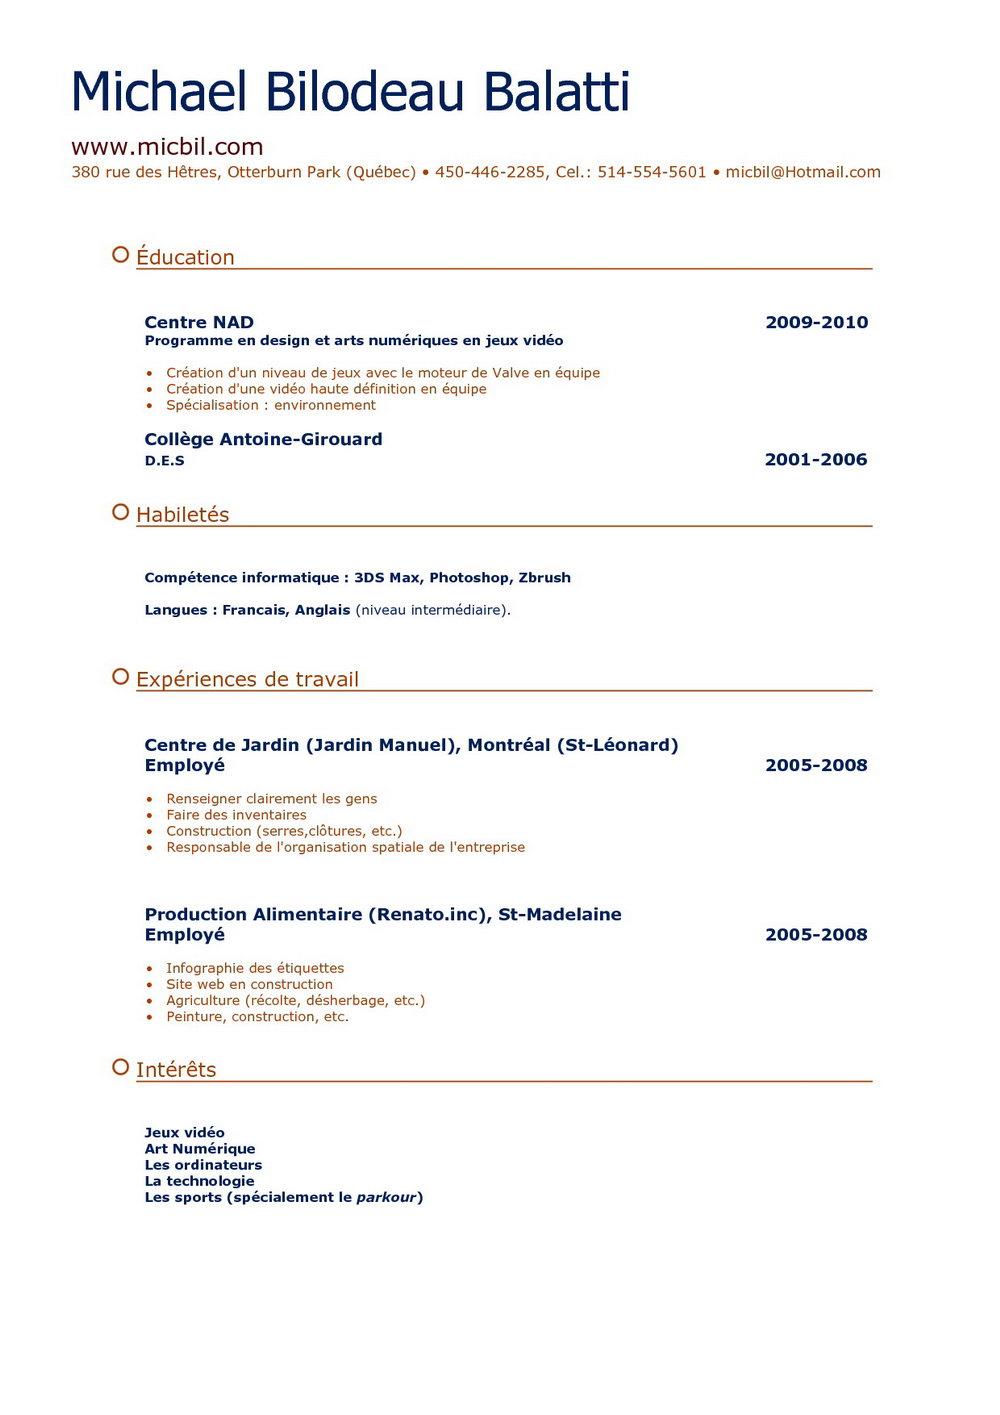 Copy Paste Resume Format - Templates #NTc2MjA | Resume Examples